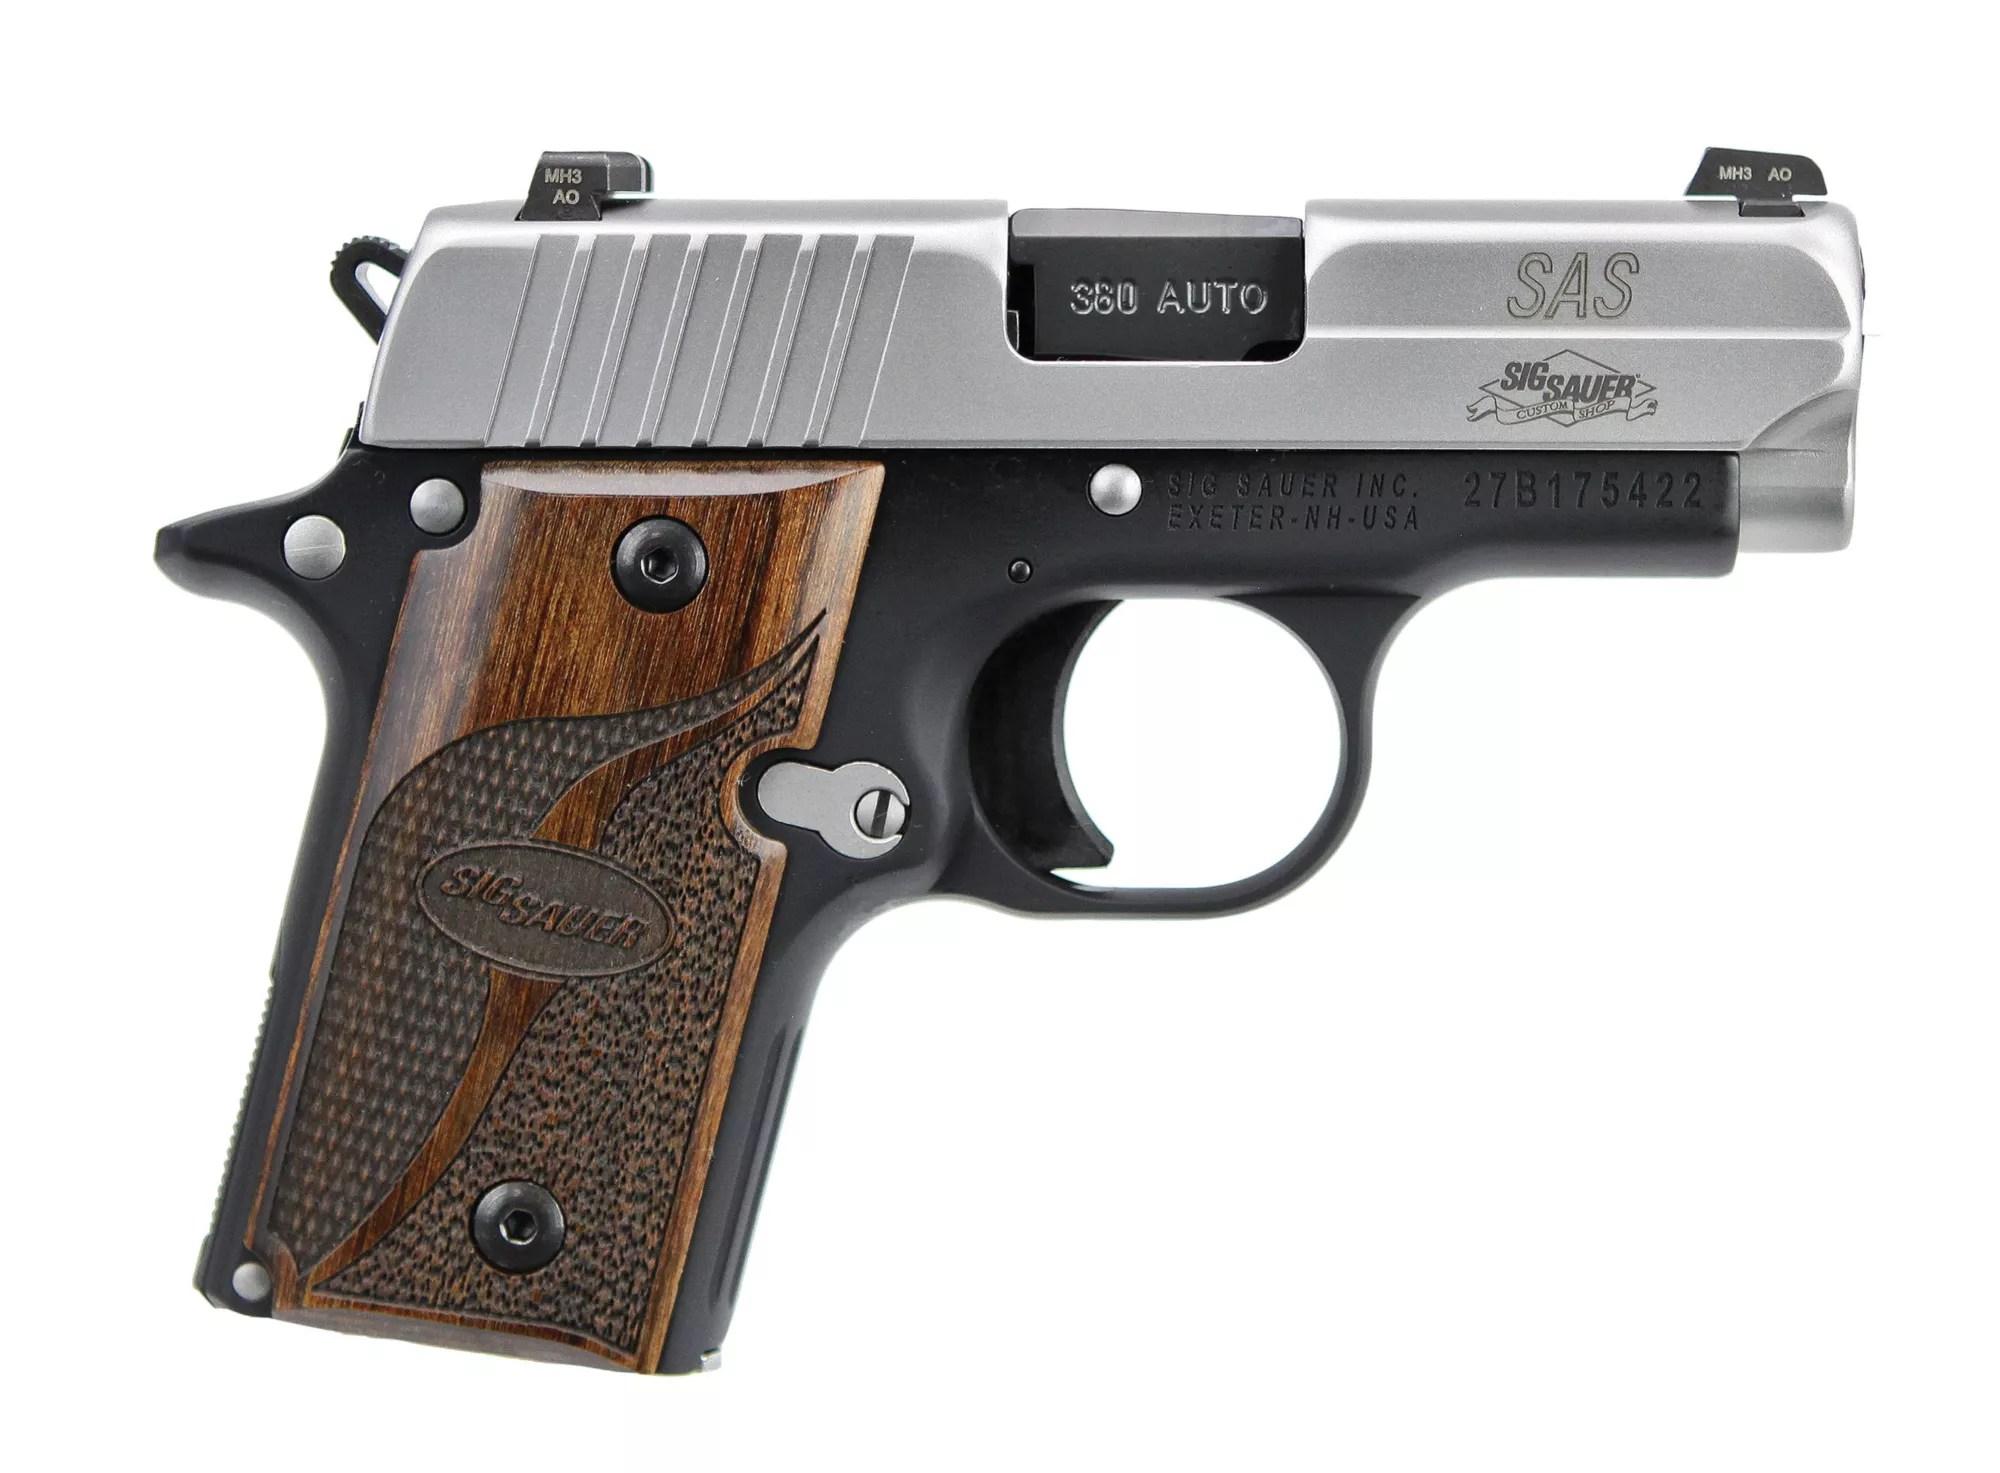 medium resolution of sig sauer p238 micro compact pistol 1